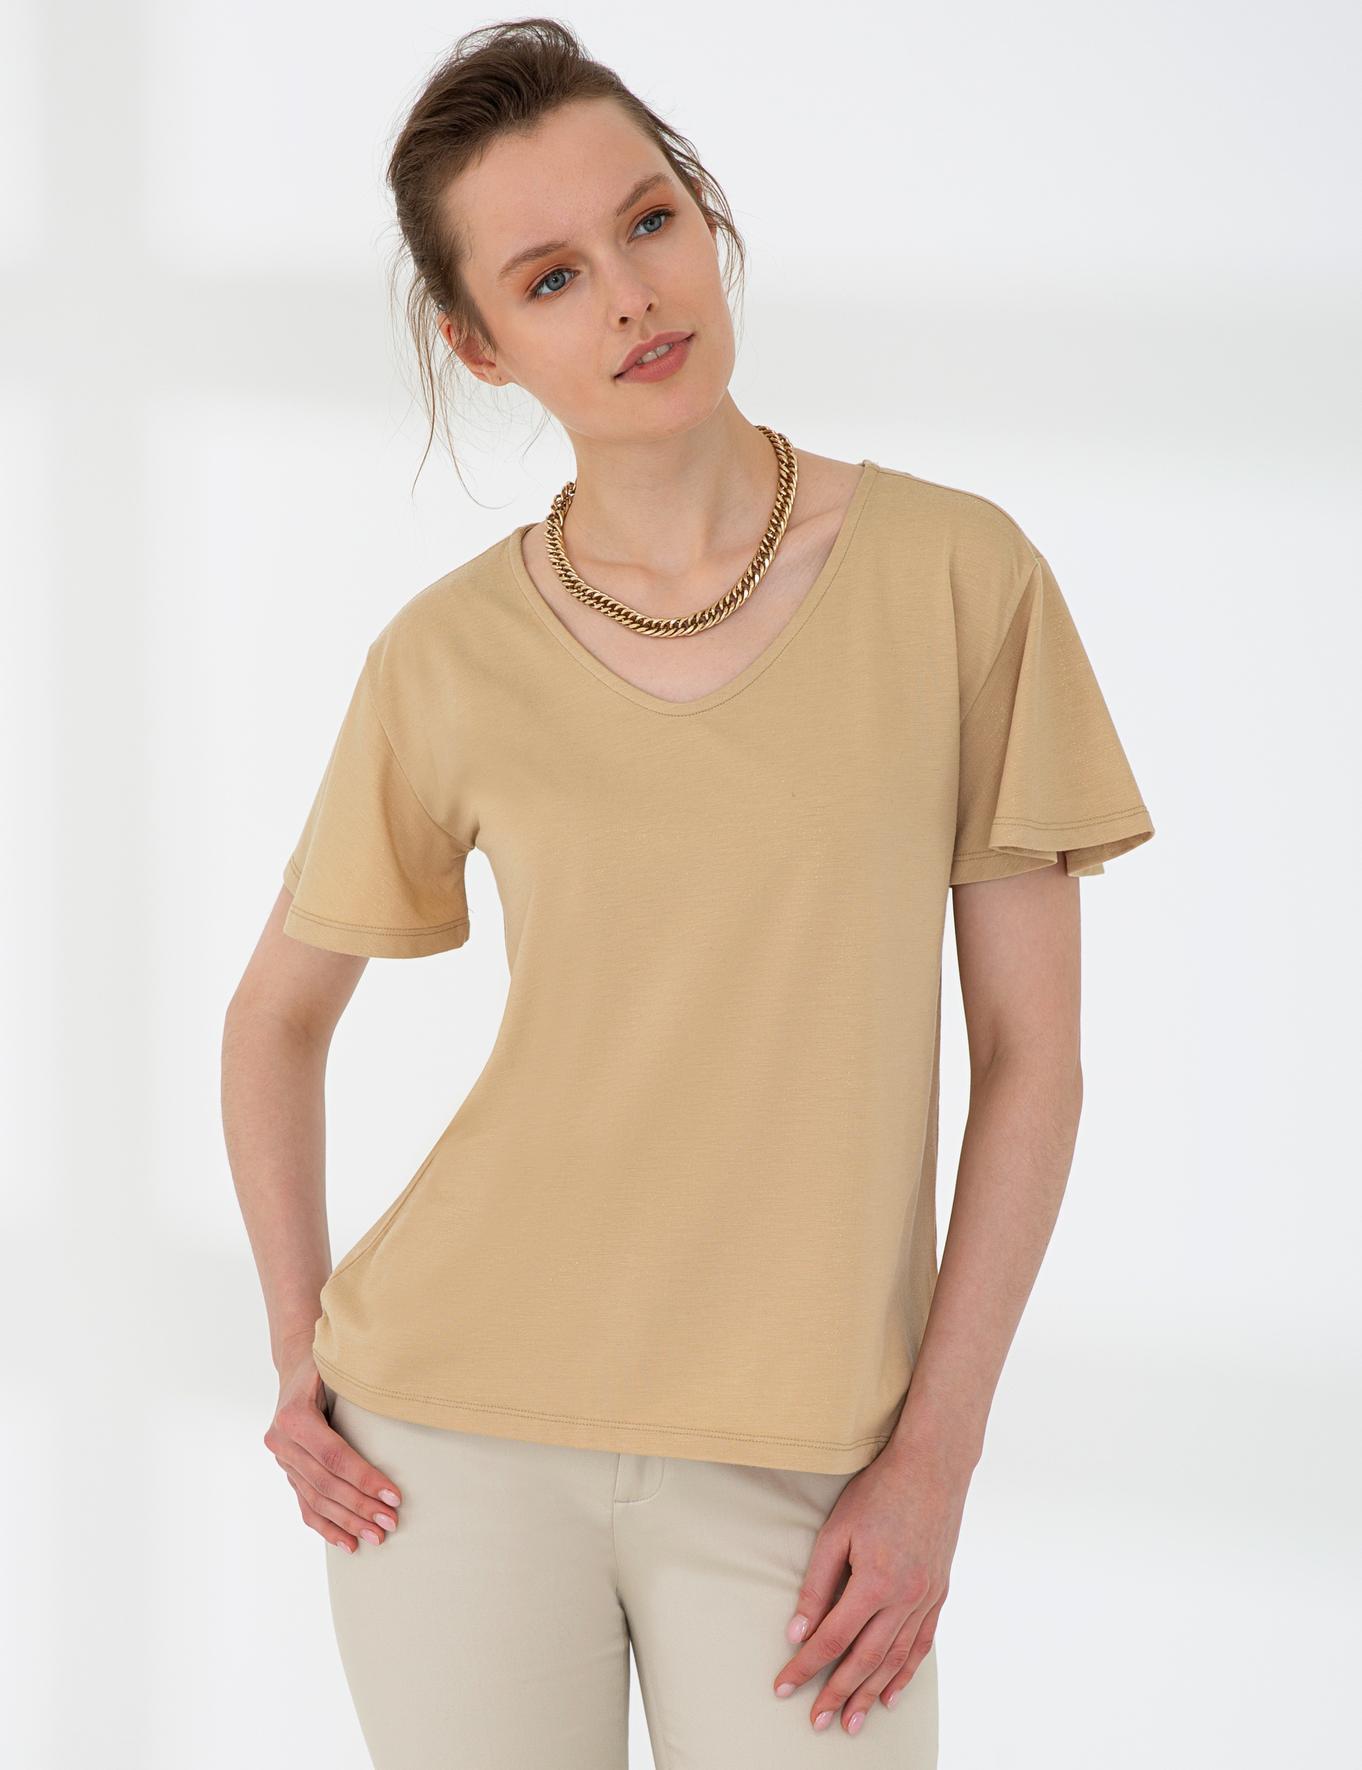 Açık Kahverengi Standart Fit V Yaka T-Shirt